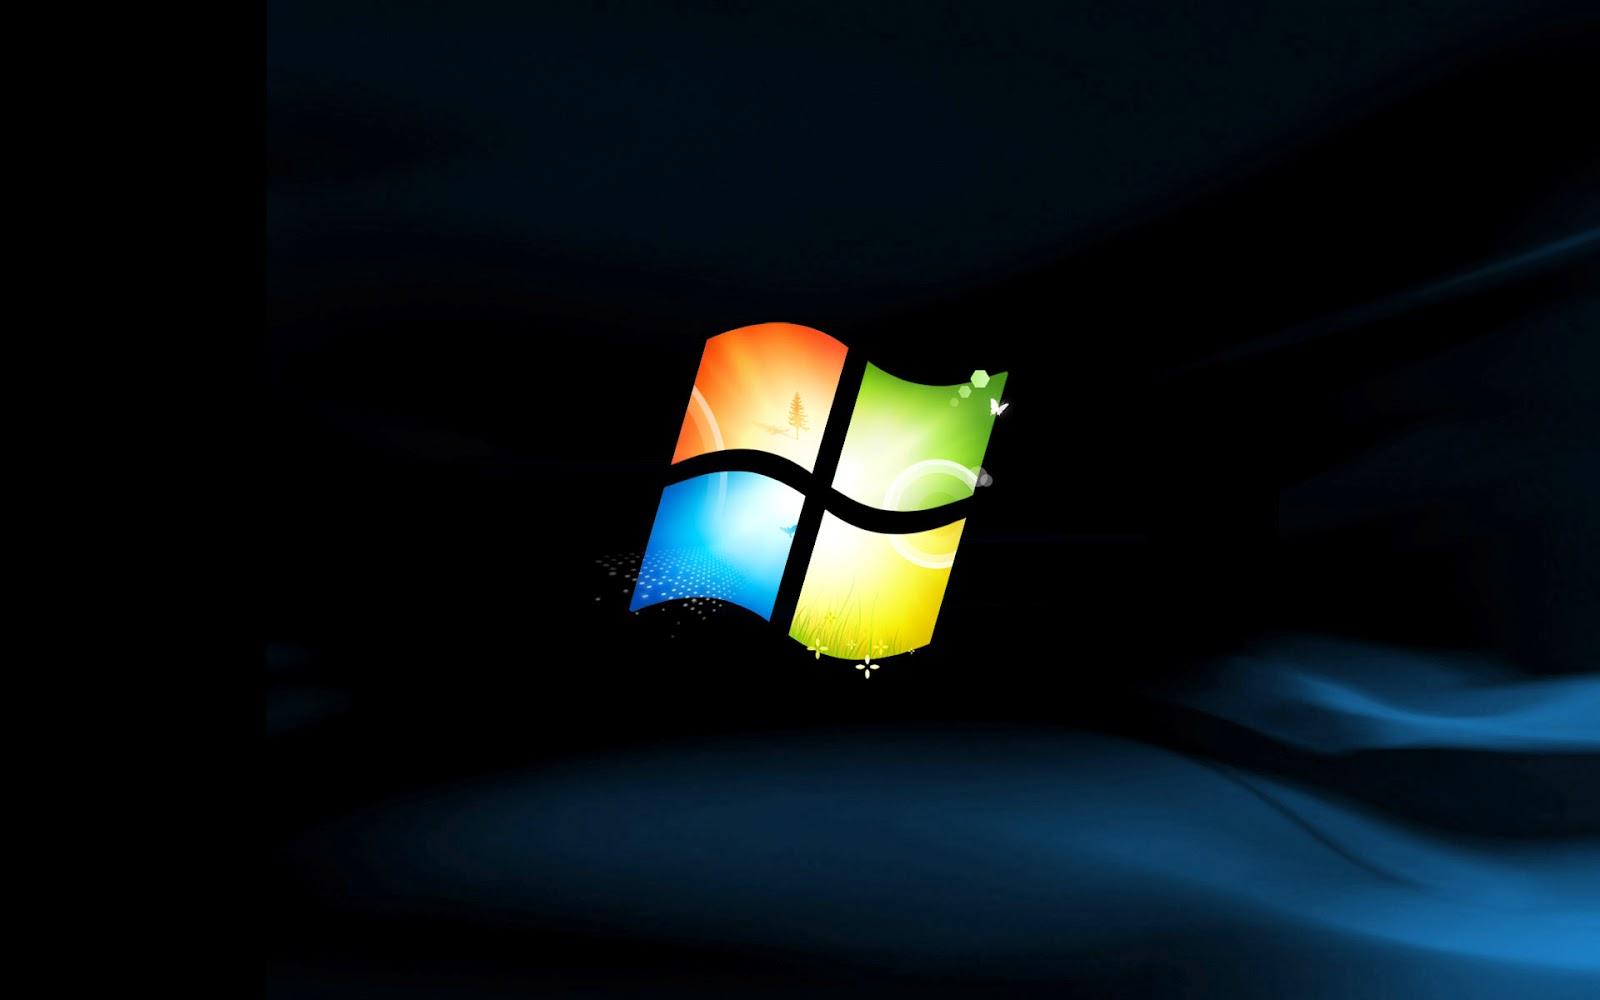 Background image windows 7 location - Desktop Background Remove Picture Location